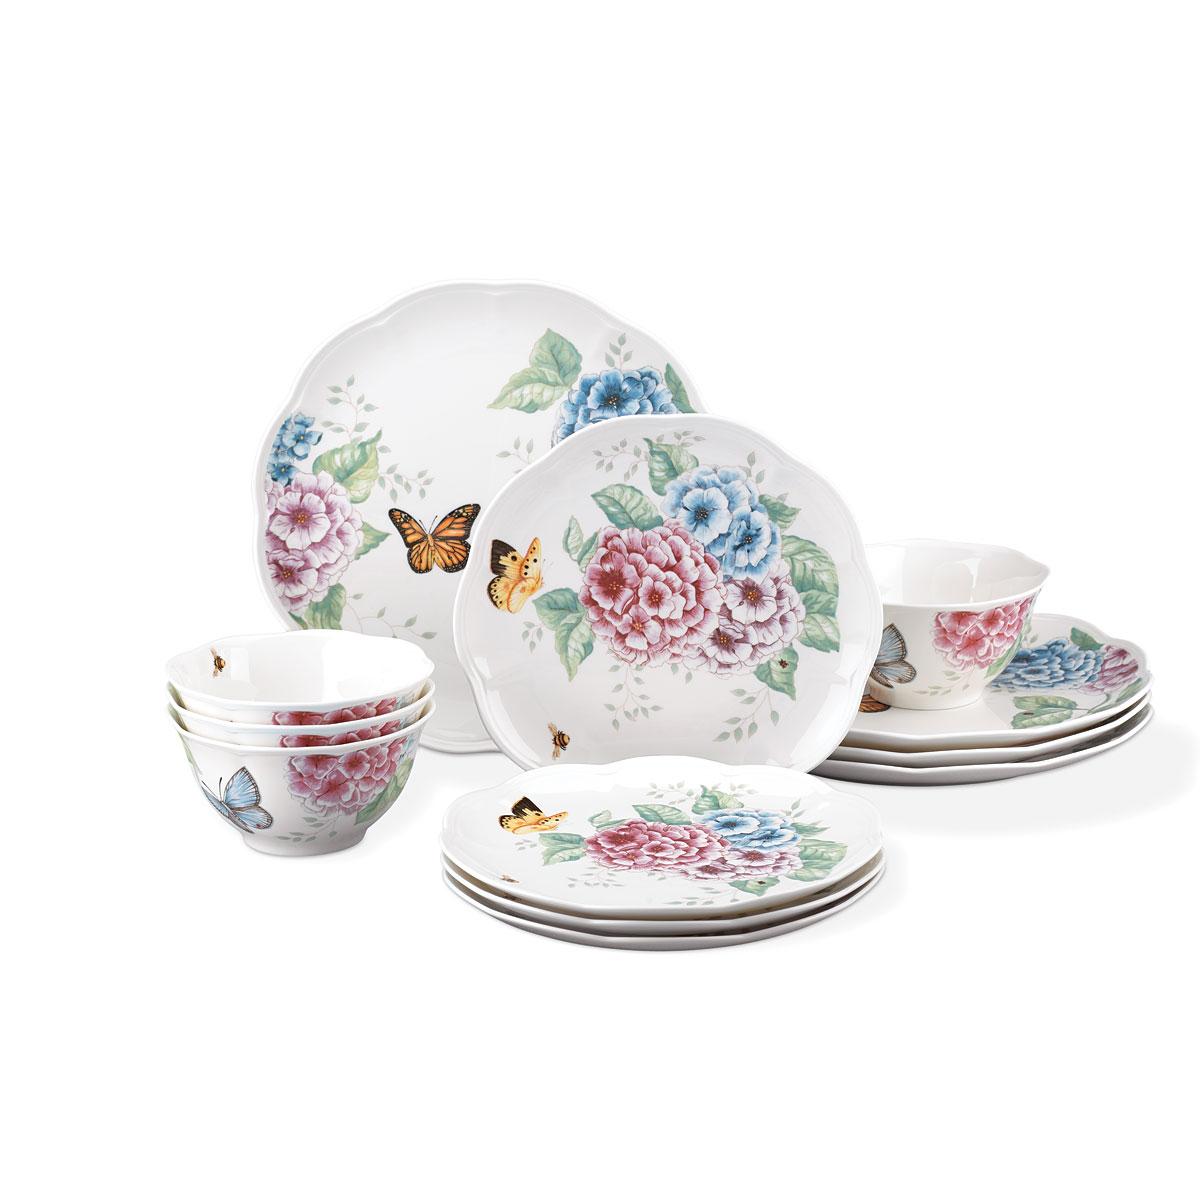 Lenox China Butterfly Meadow Hydrangea 12 Piece Set